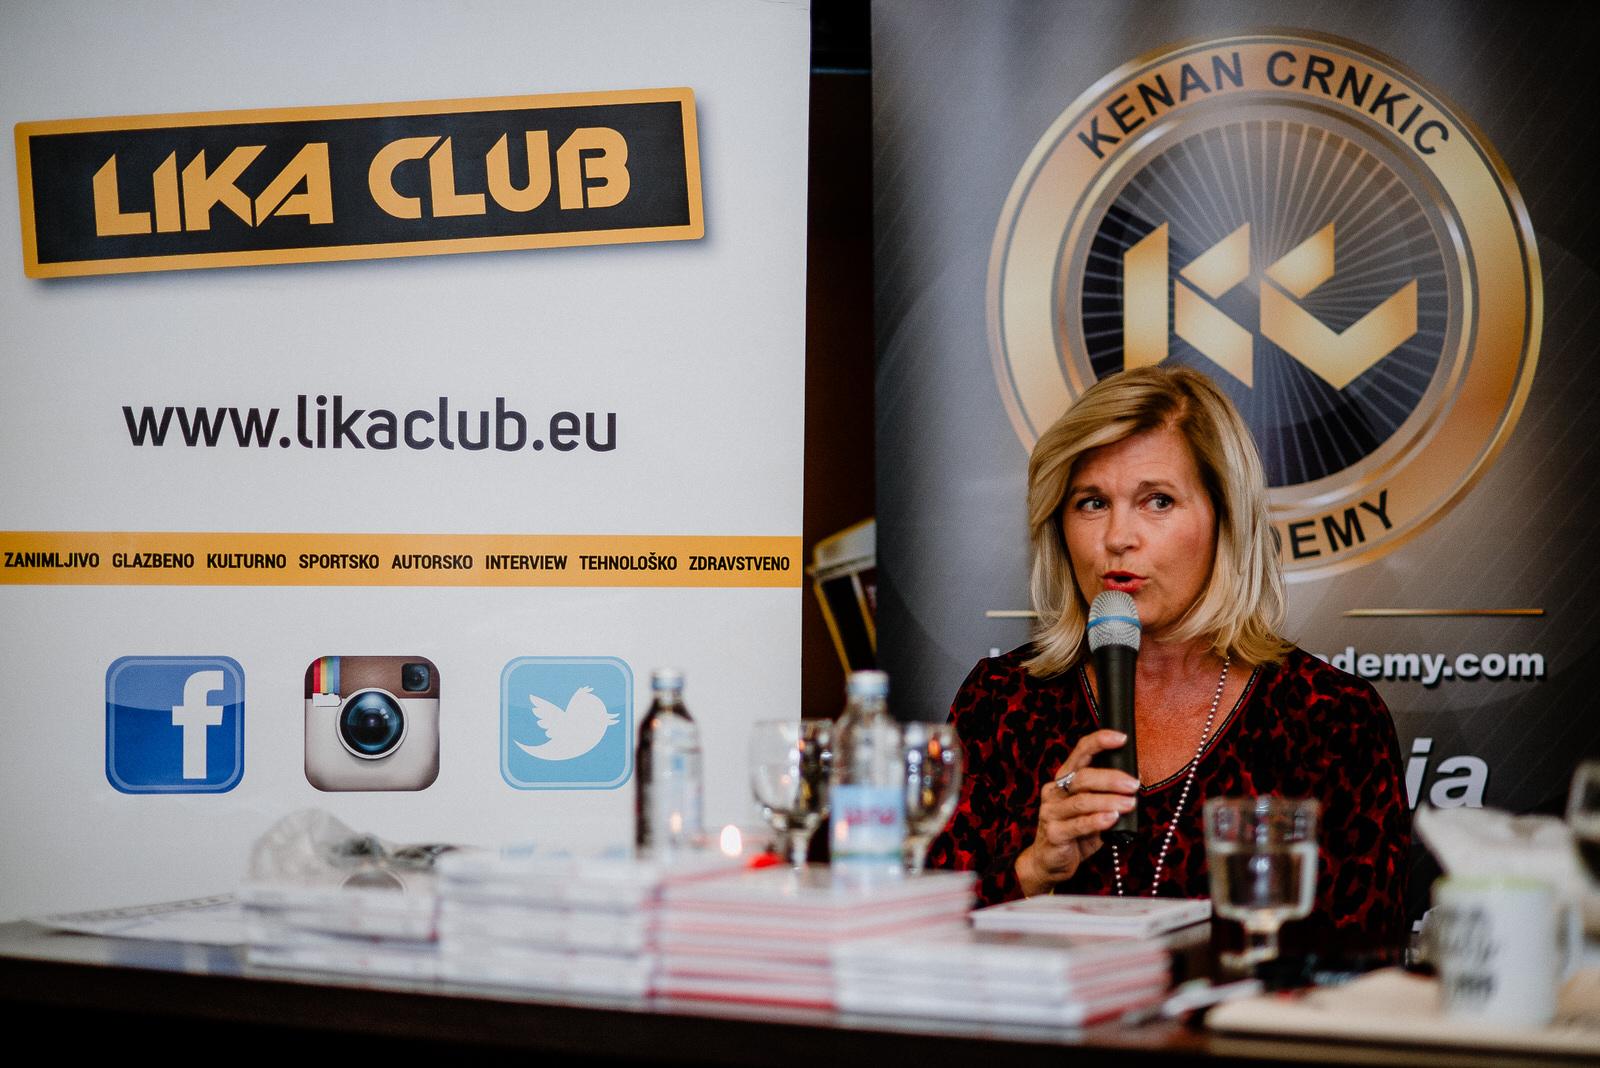 likaclub_otočac_book-caffe-paradisso_kenan-crnkić_2019-7